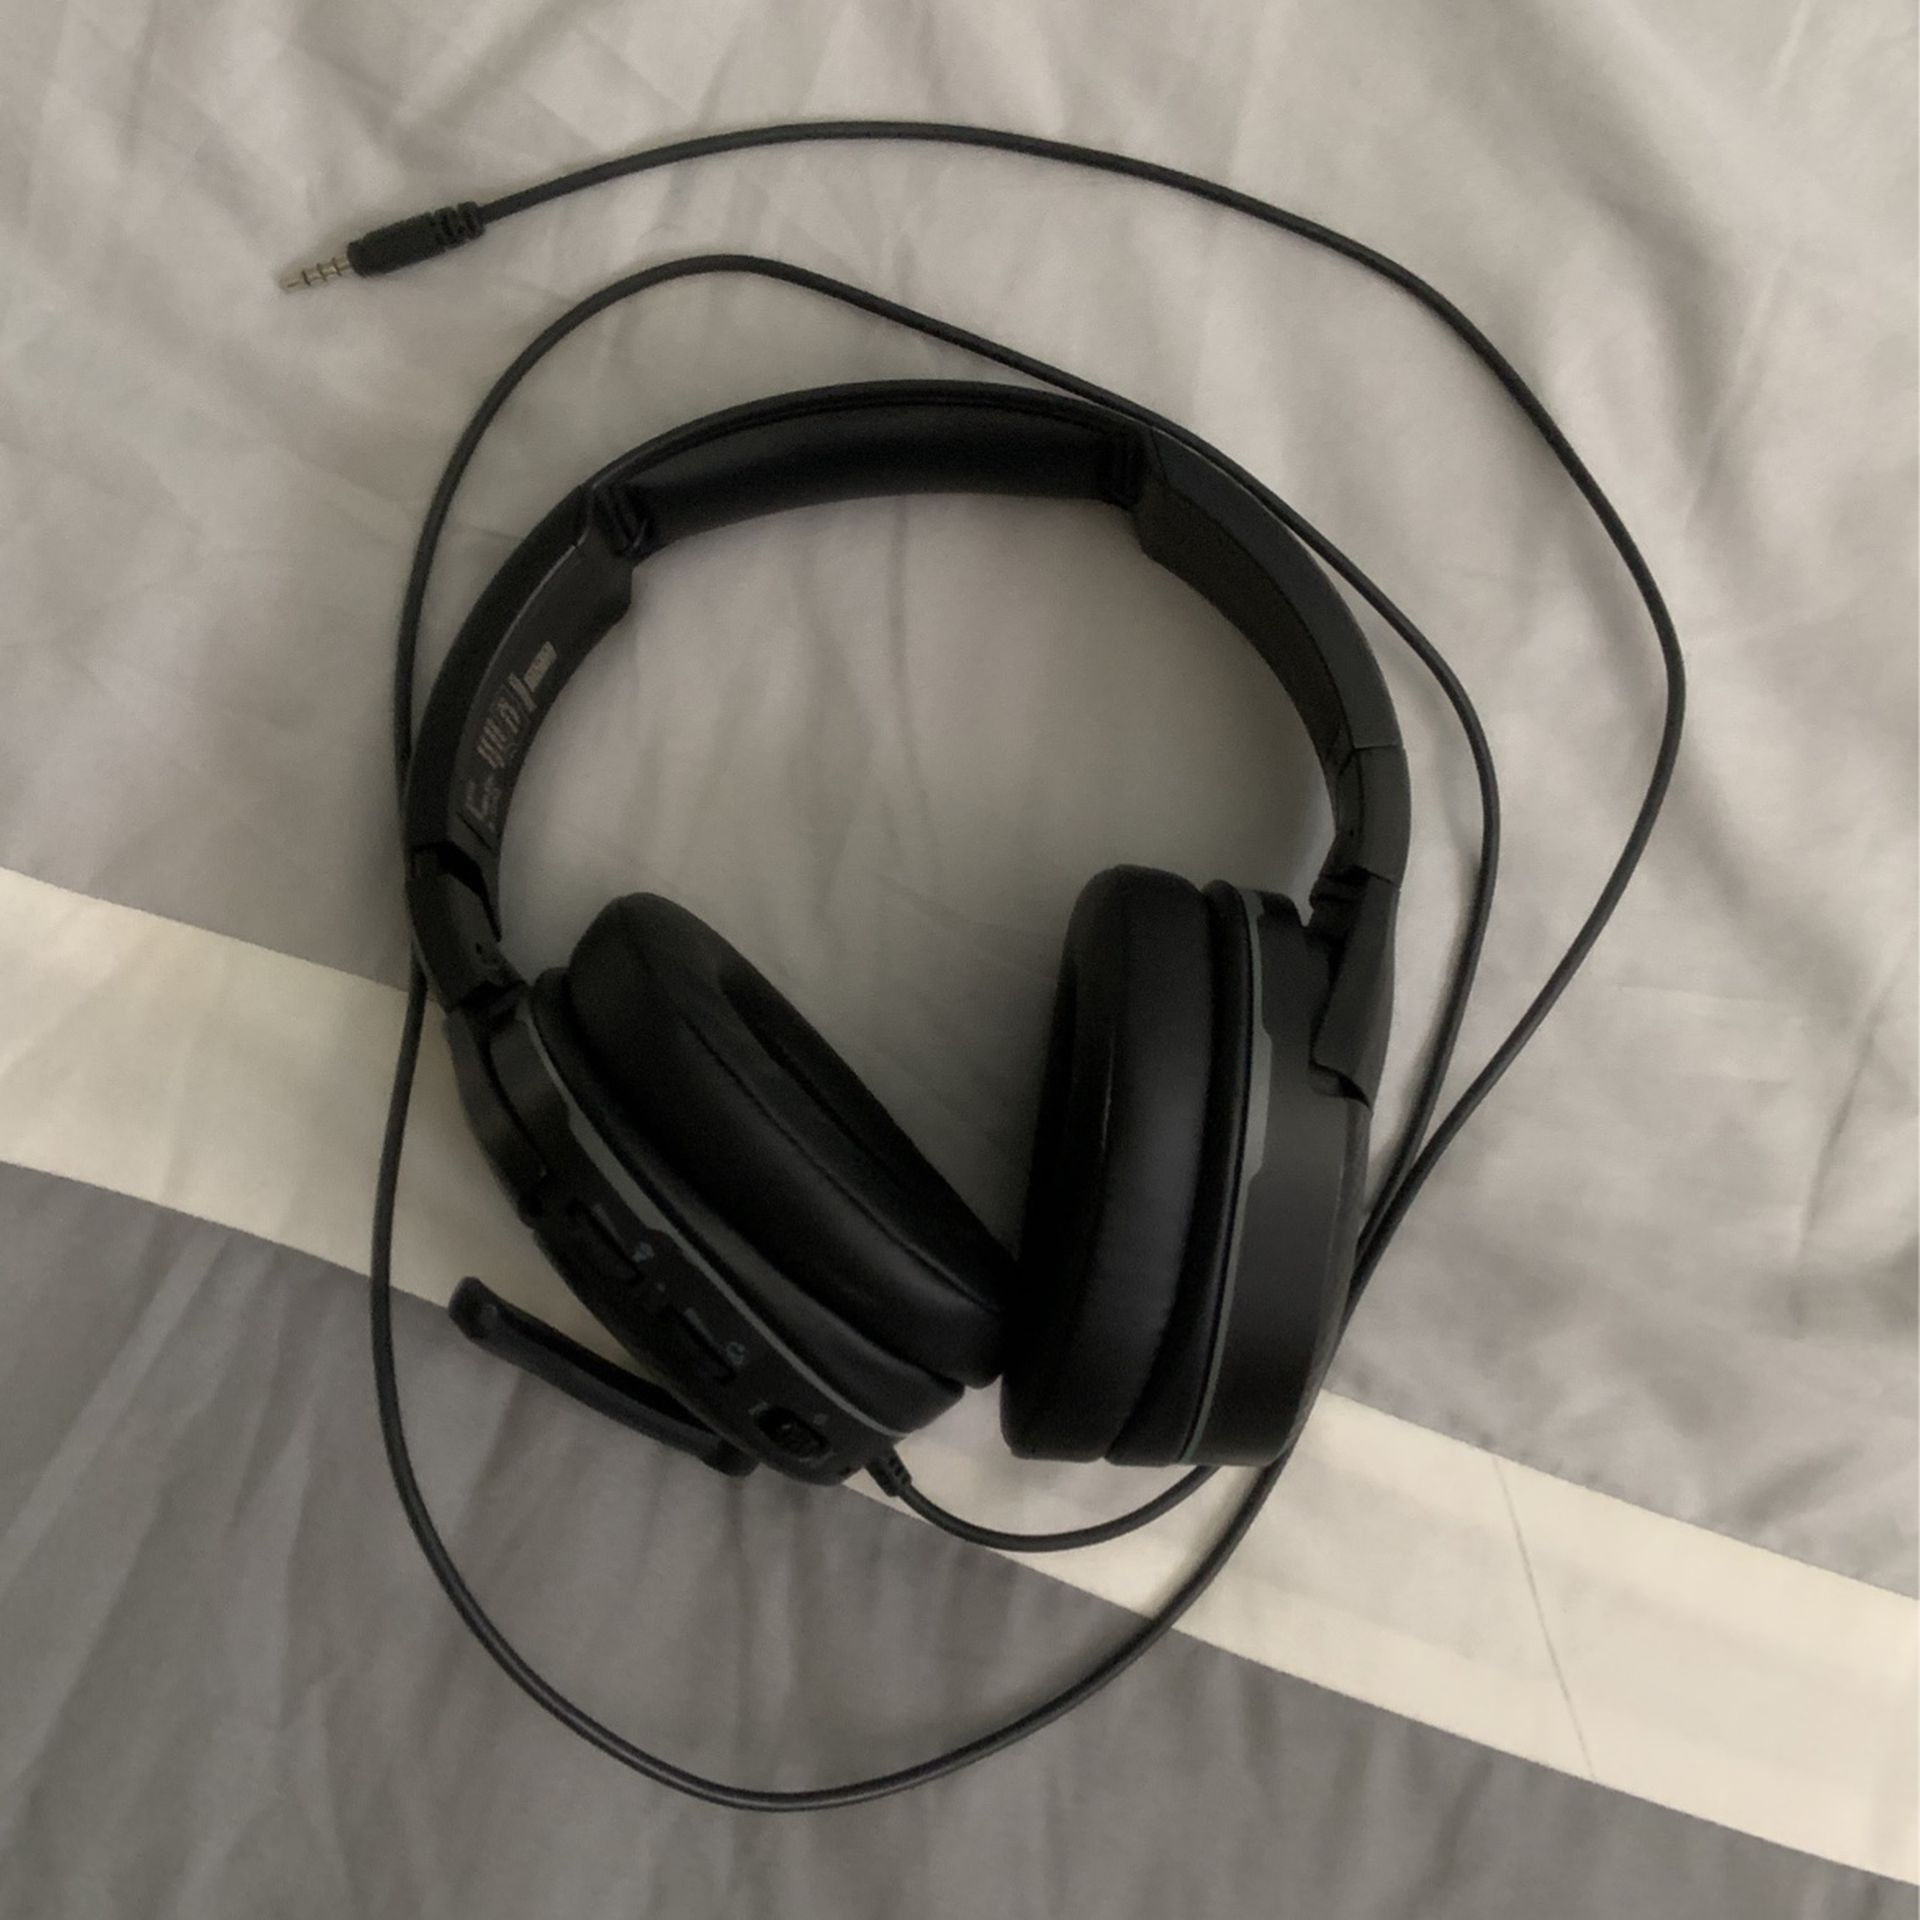 Turtle Beach Headphones